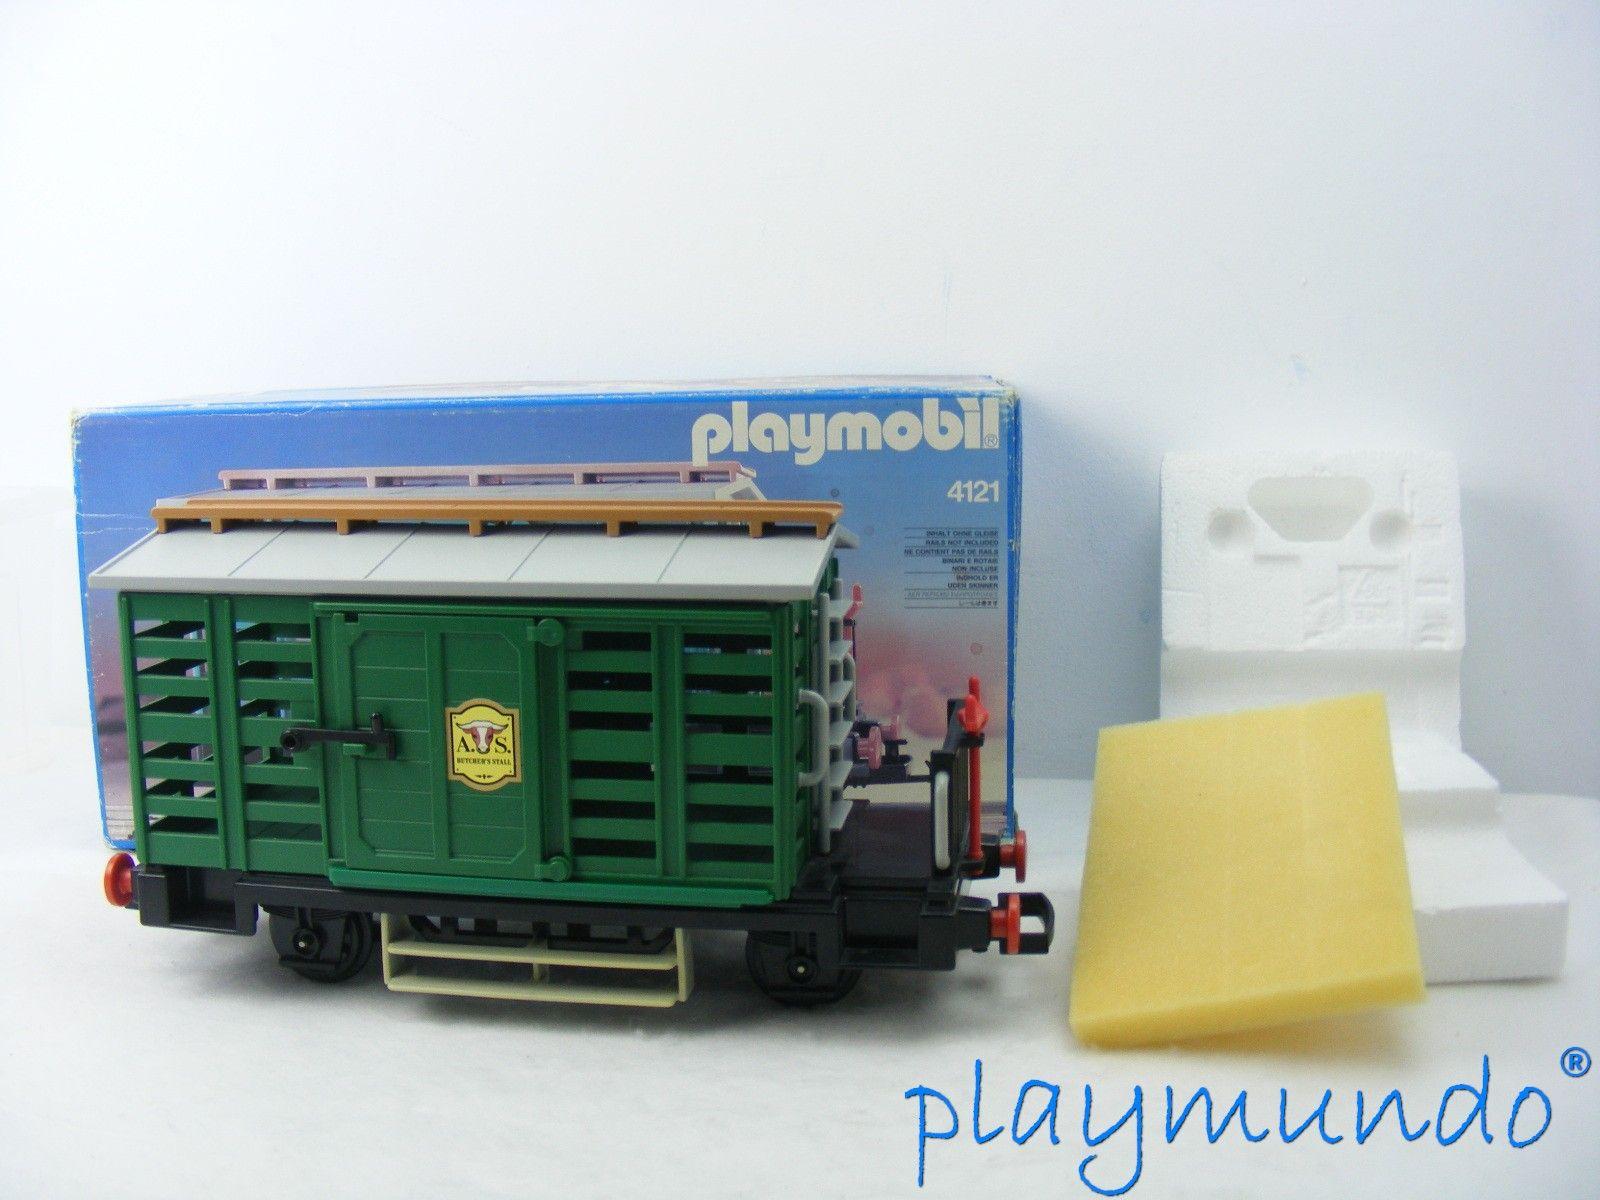 PLAYMOBIL 4121 VAGON VERDE DEL OESTE (AÑO 1988 -1996) http://www.playmundo.es/playmobil-4121-vagon-verde-del-oeste-ano-1988--1996-9417-p.asp